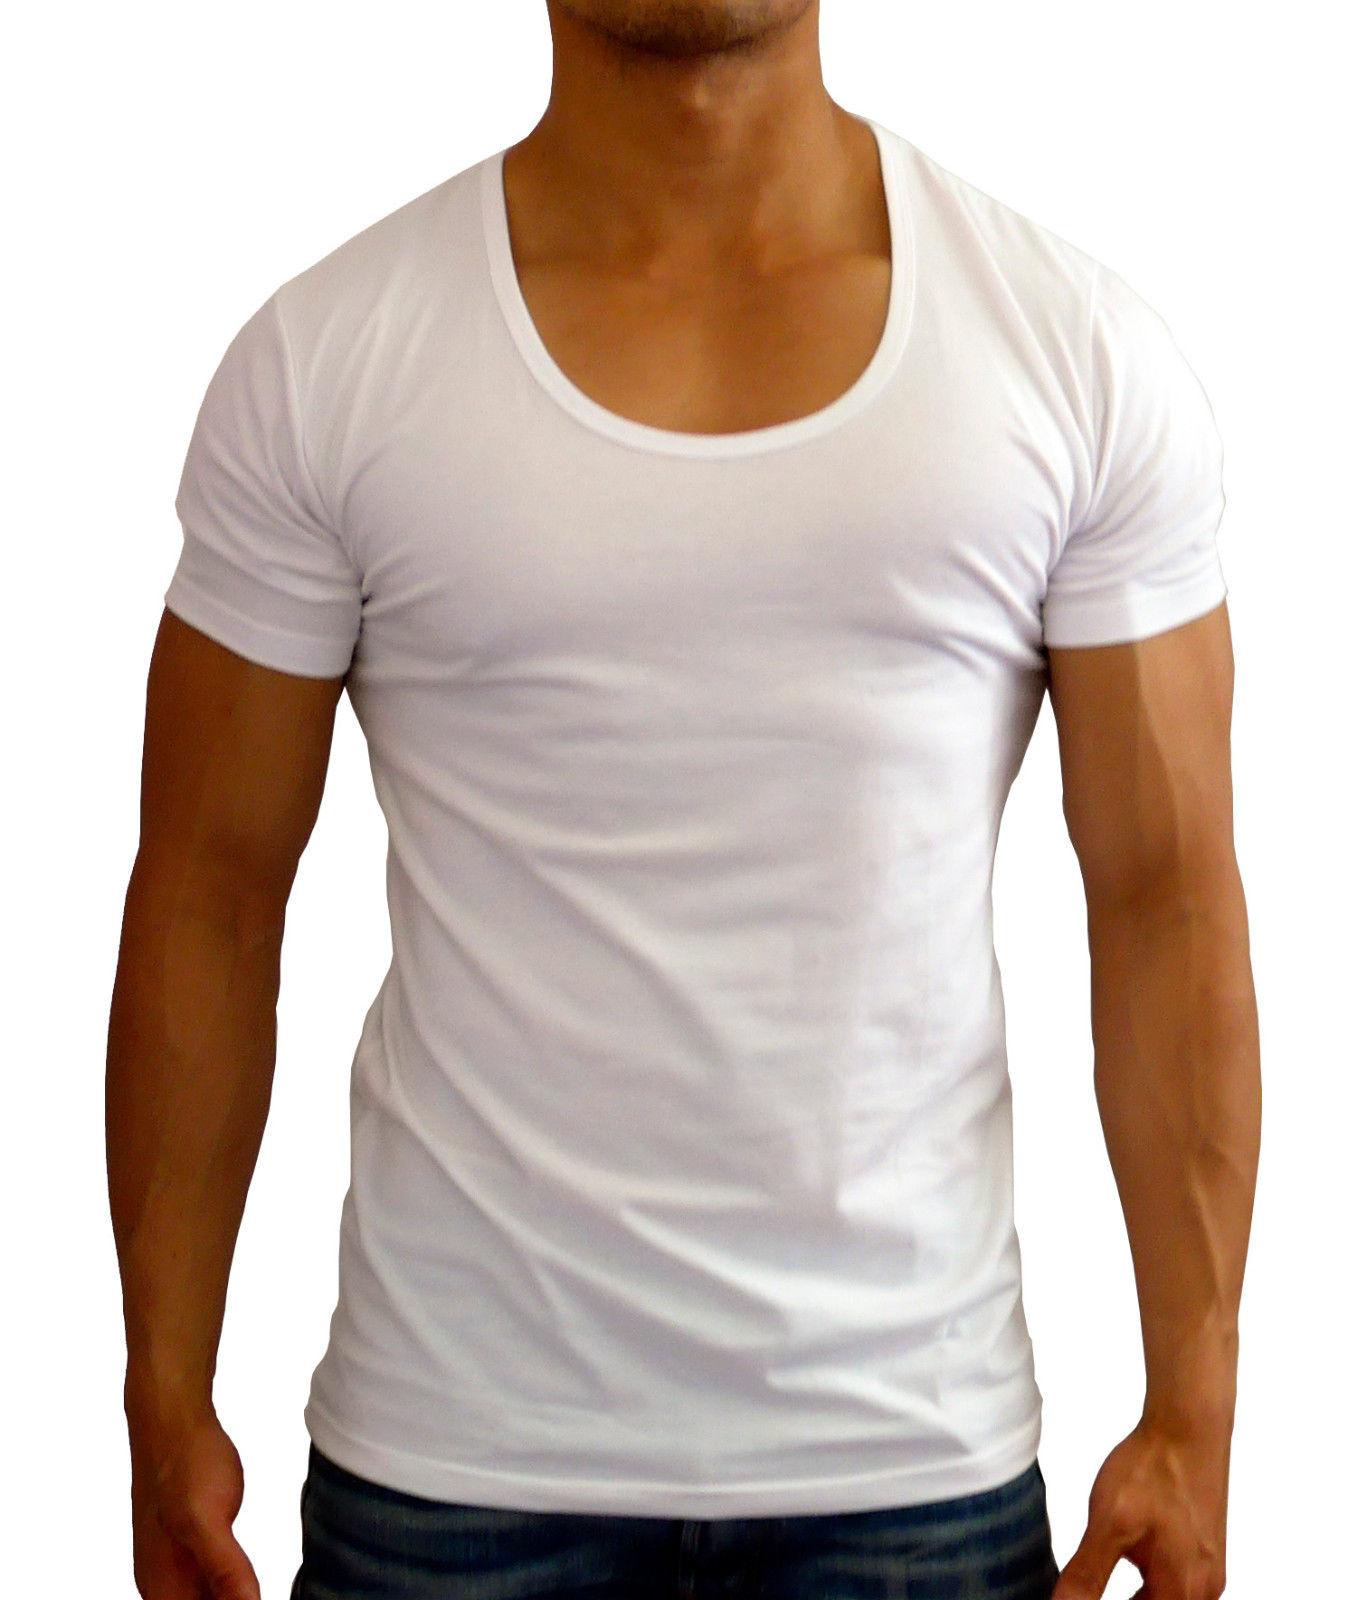 f8951b43e61f $17.99 AUD - Mens Plain White Deep Scoop Neck T-Shirt Muscle Slim Fit  Casual Gym Fashion #ebay #Fashion